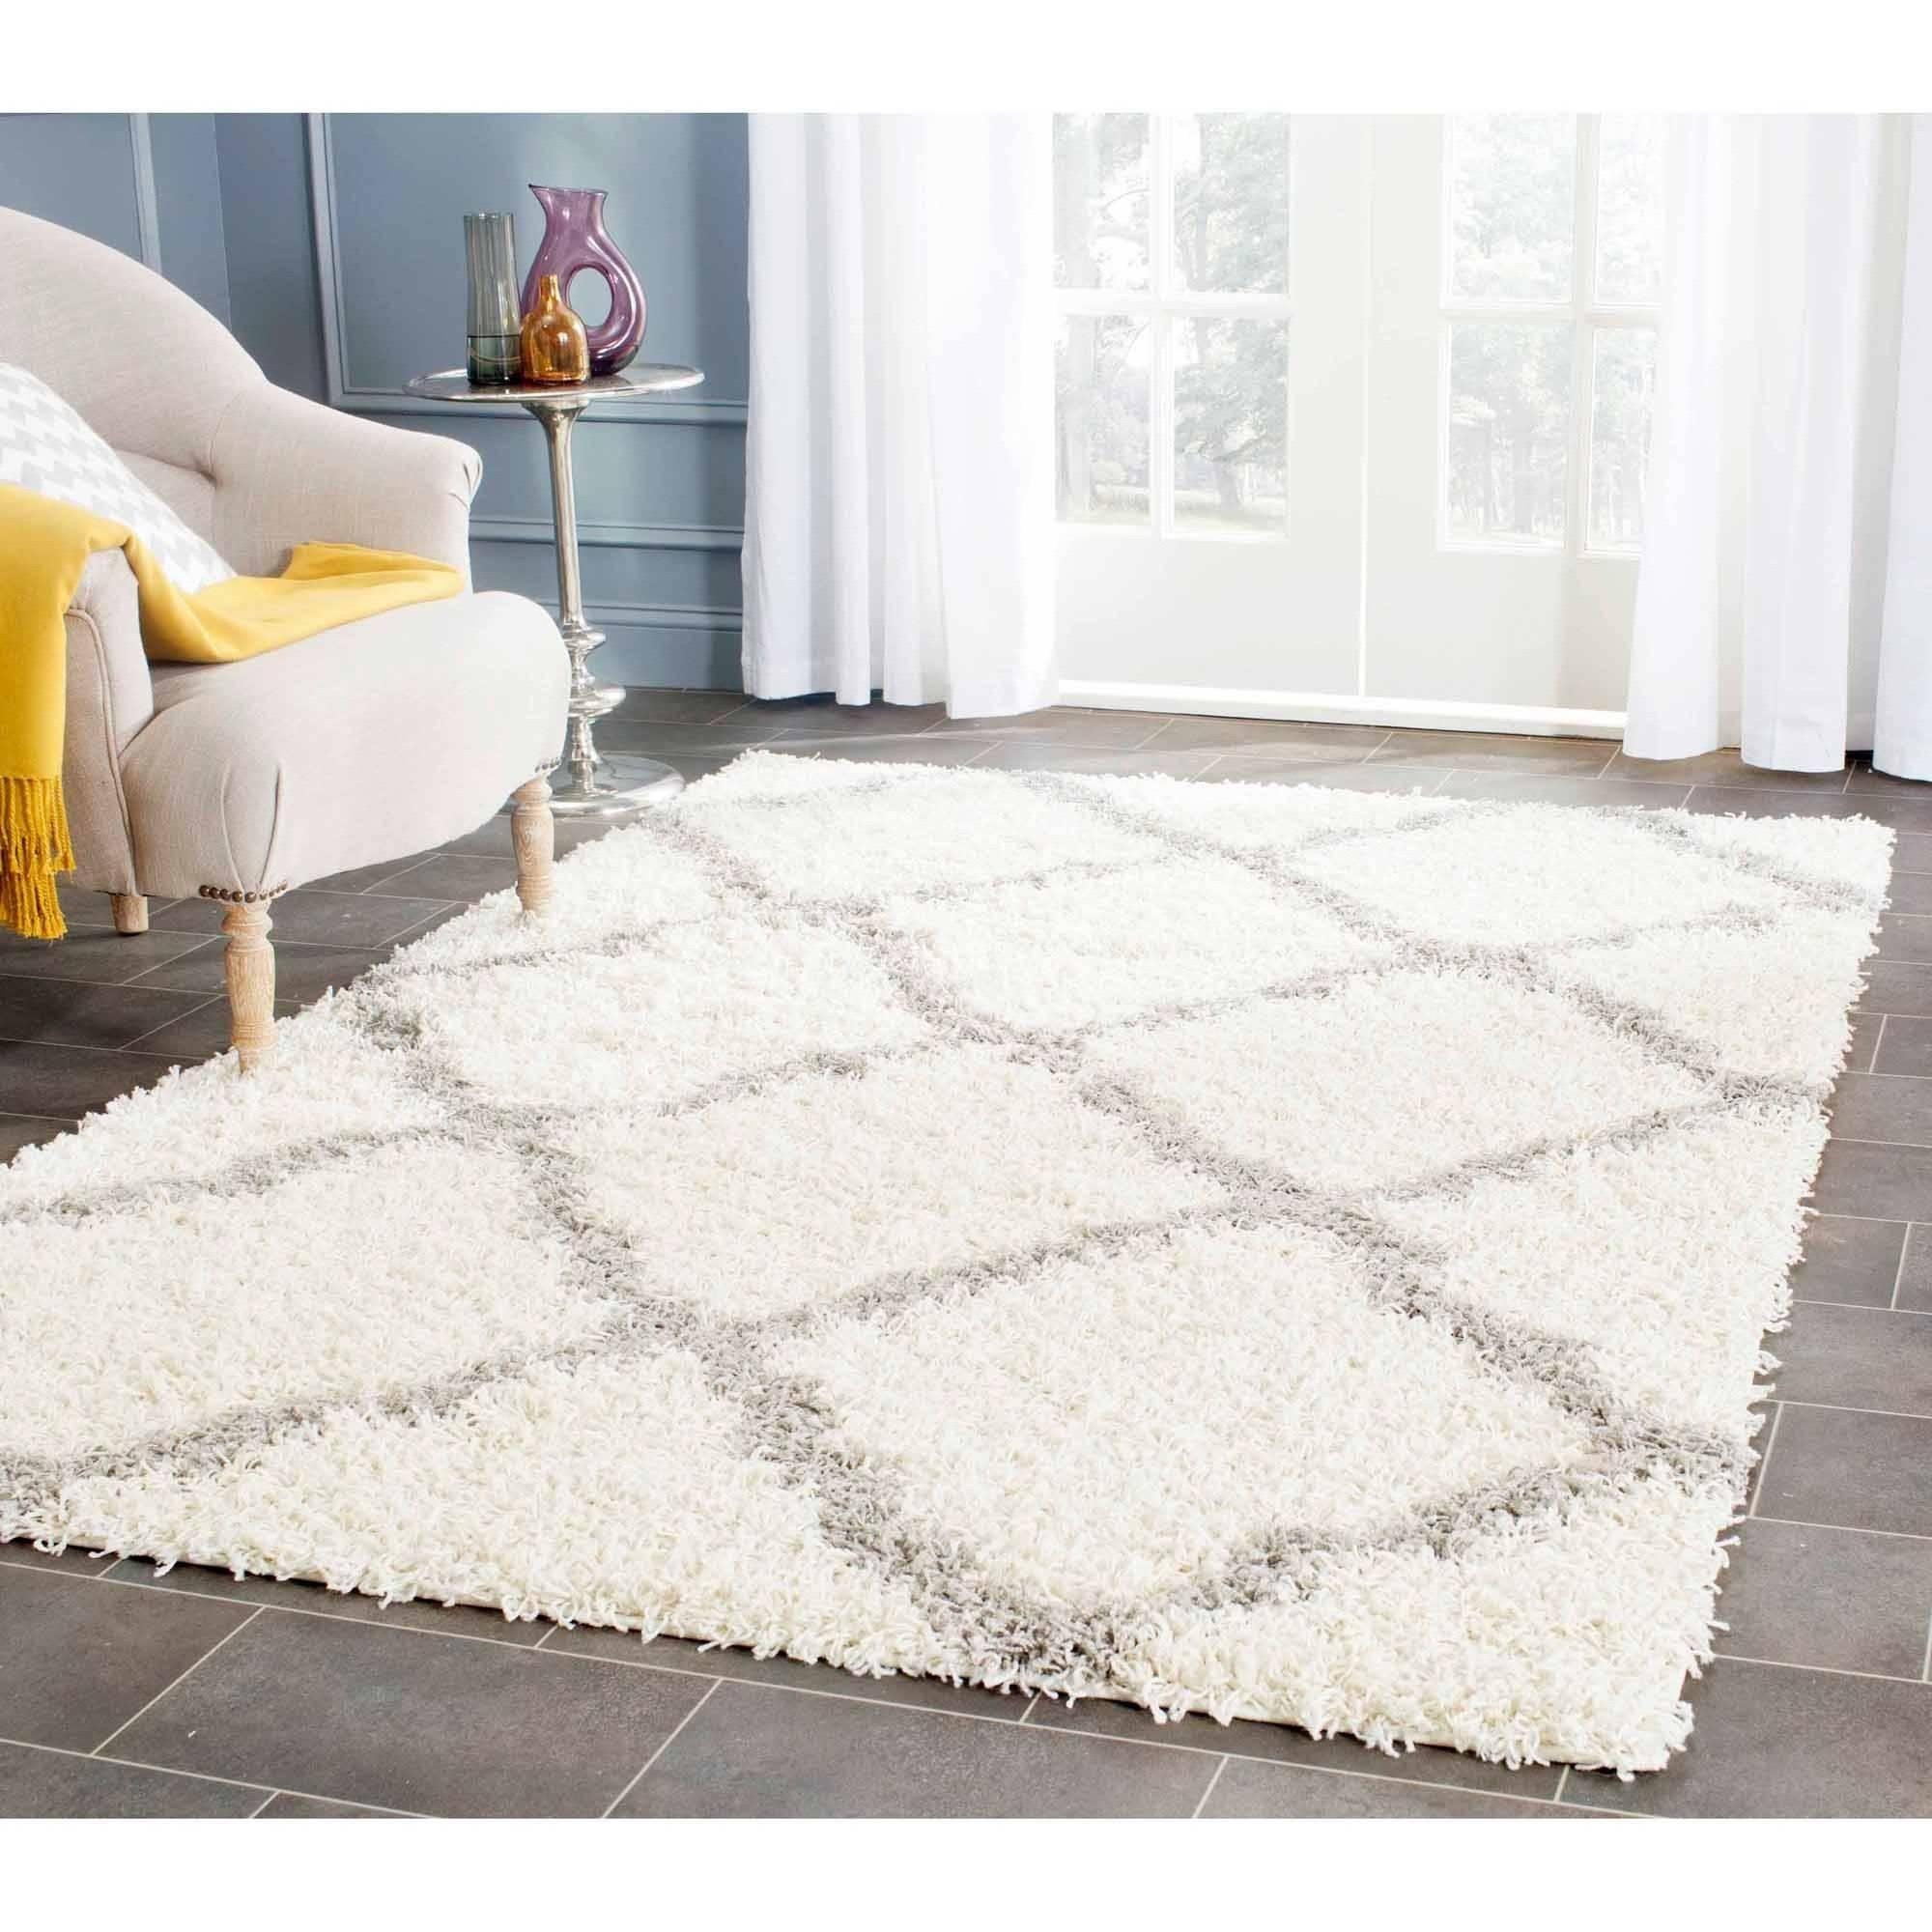 shop the collection. safavieh lavena solid plush shag area rug ... SFSLUOS